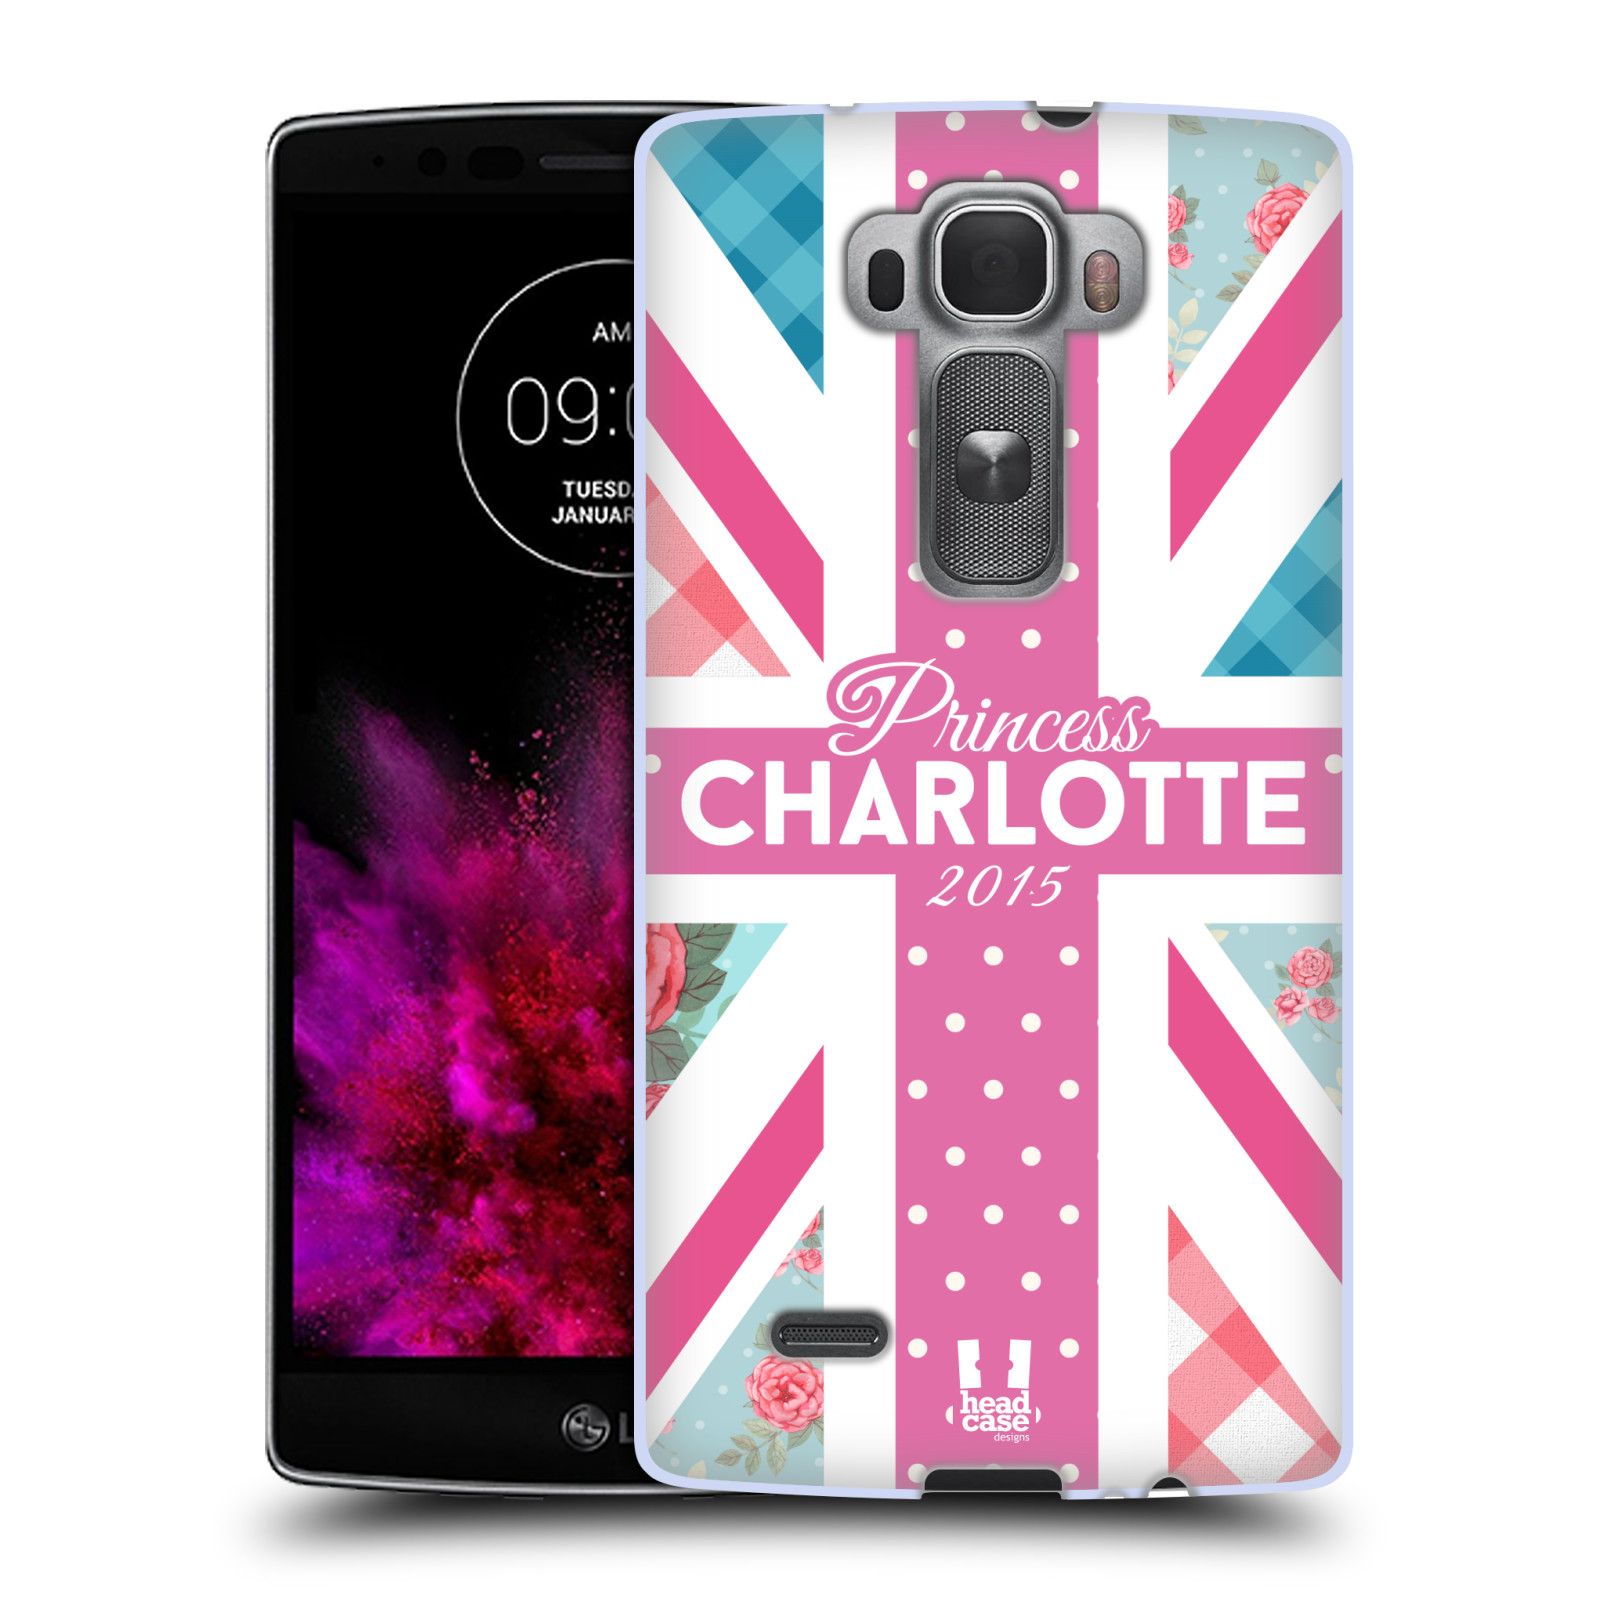 Silikonové pouzdro na mobil LG G Flex 2 HEAD CASE PRINCEZNIČKA CHARLOTTE (Silikonový kryt či obal na mobilní telefon LG G Flex 2 H955)